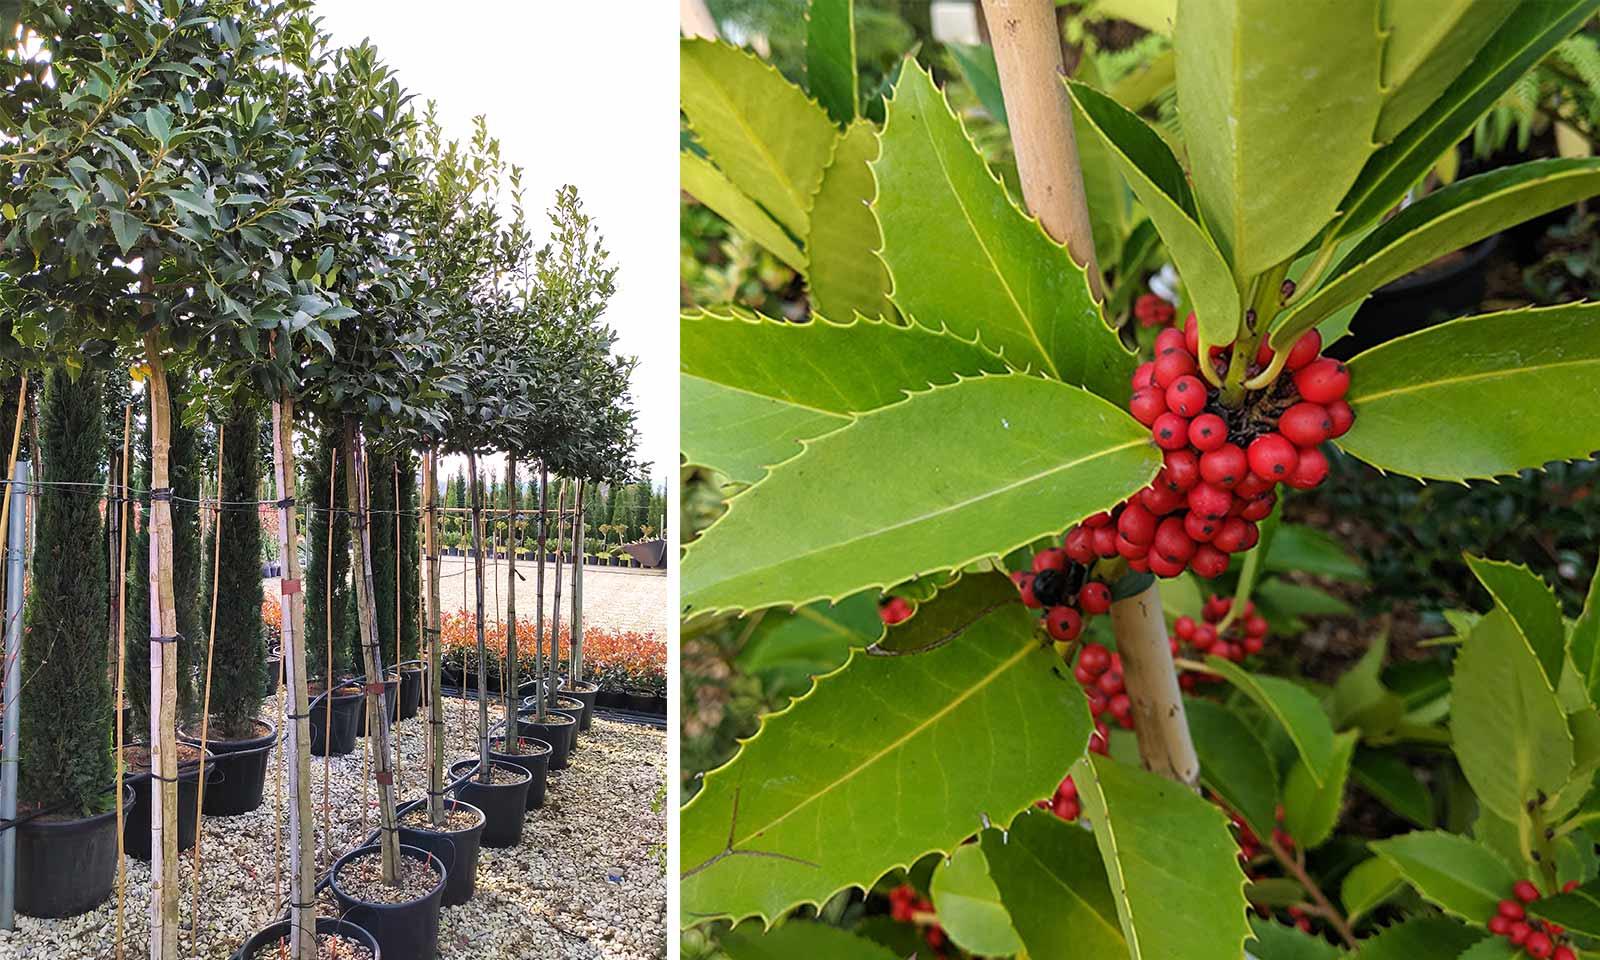 Ilex x Koehneana 'Chestnut Leaf' / Ilex Castaneifolia (Holly 'Chestnut Leaf') - Standard